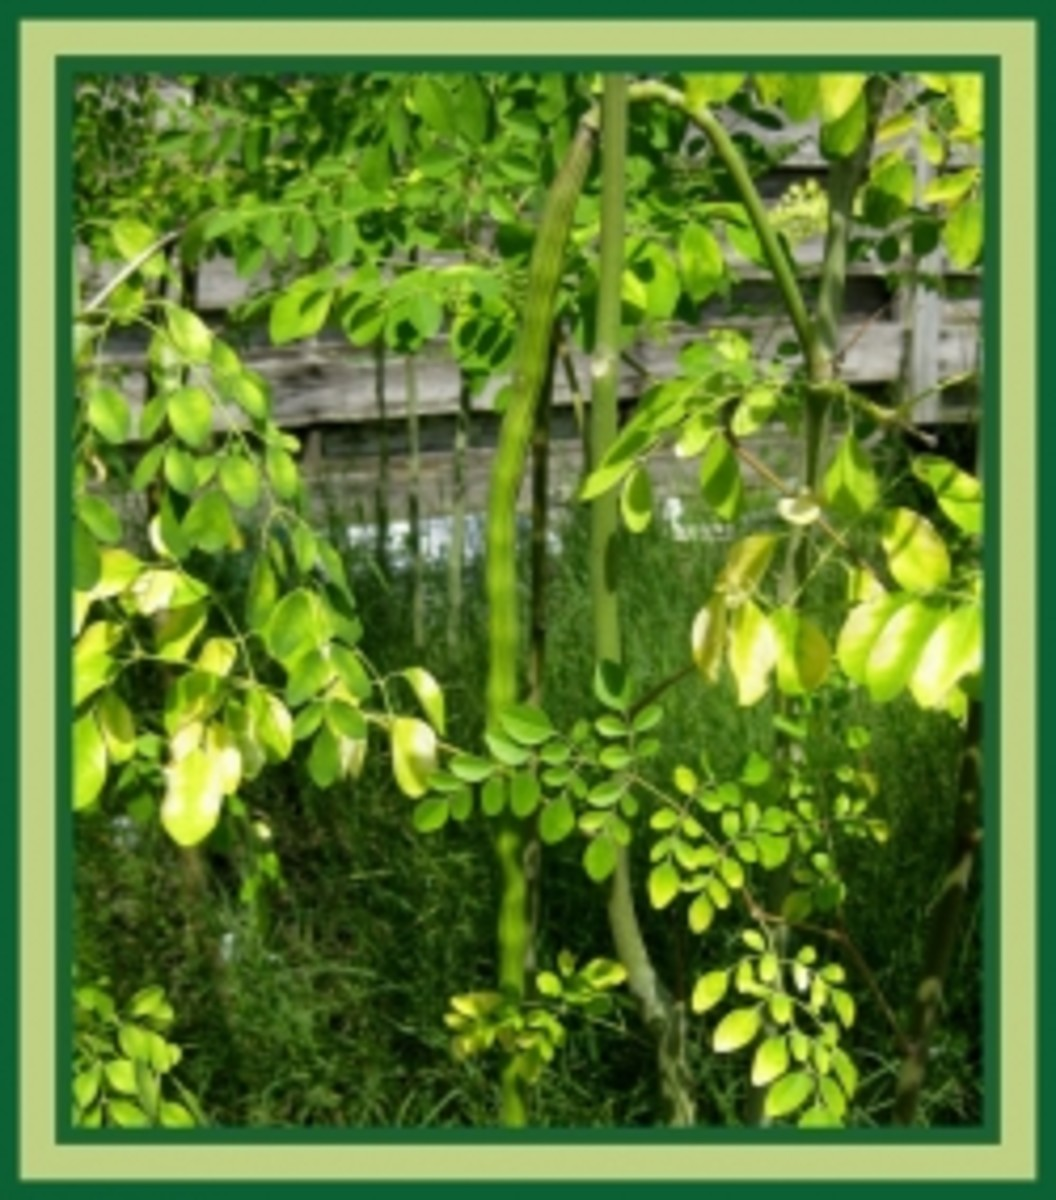 The Drumstick Tree - Moringa